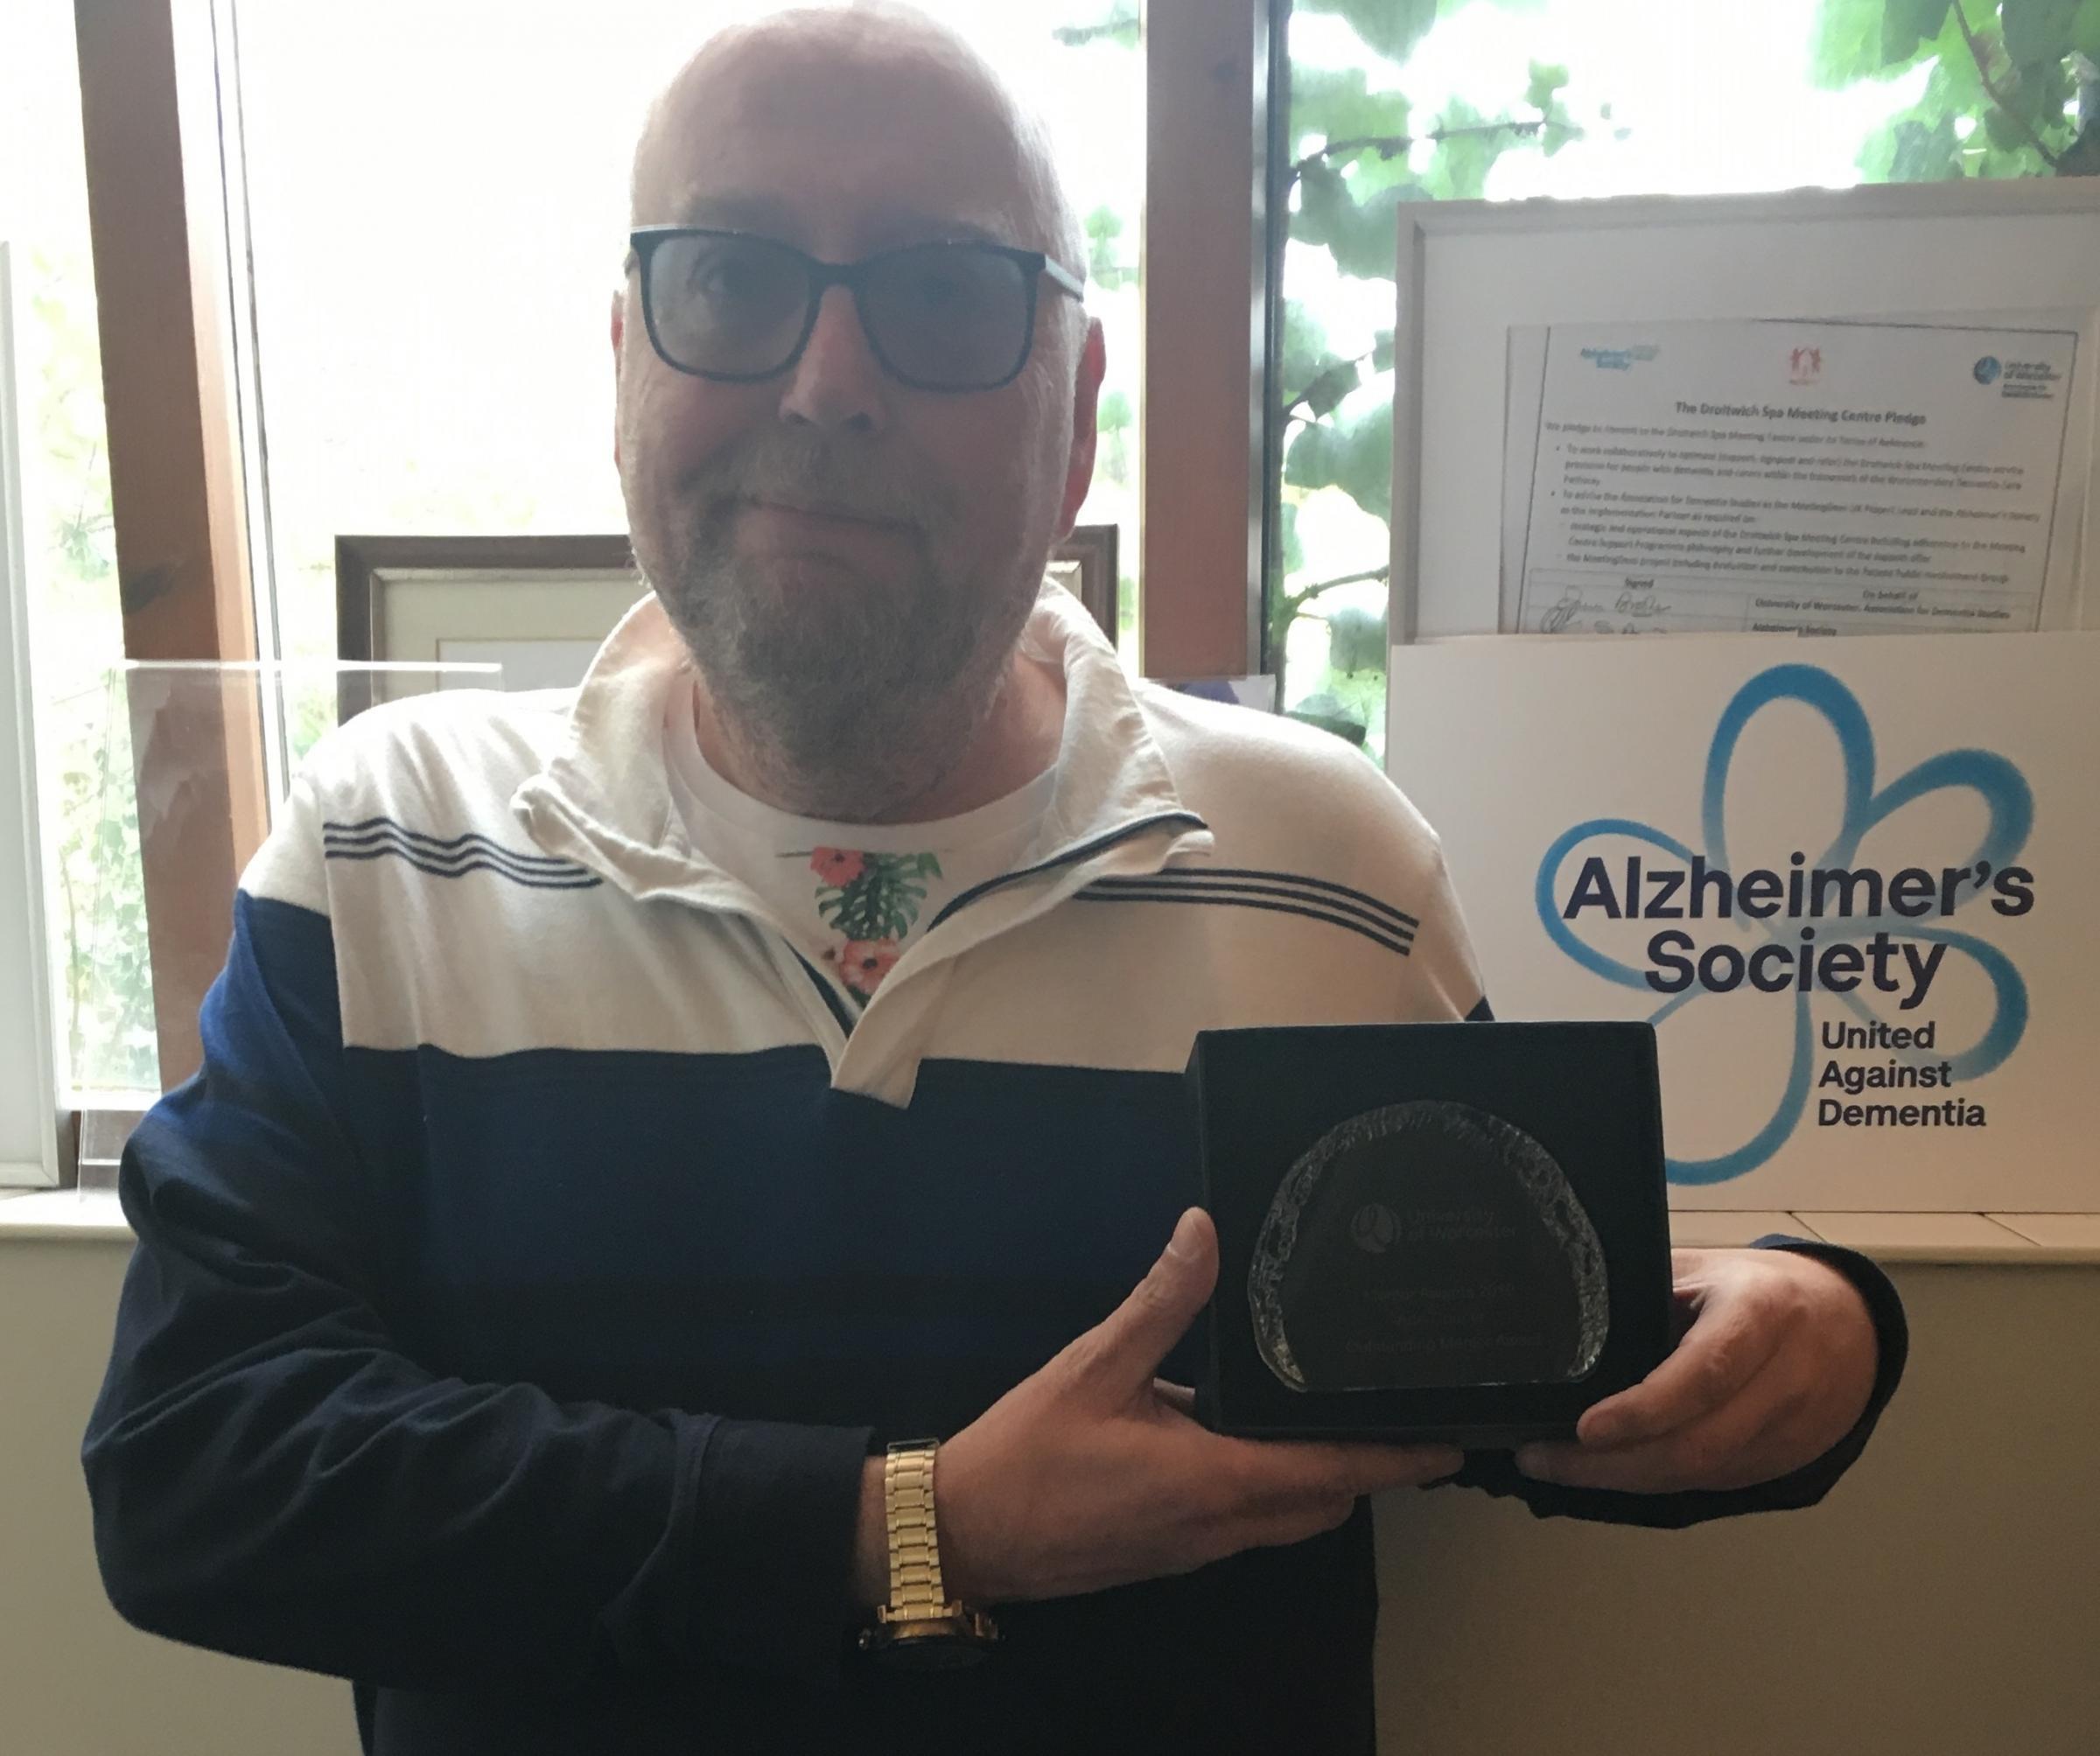 Alzheimer's Society mentor from Worcester wins award - Dudley News